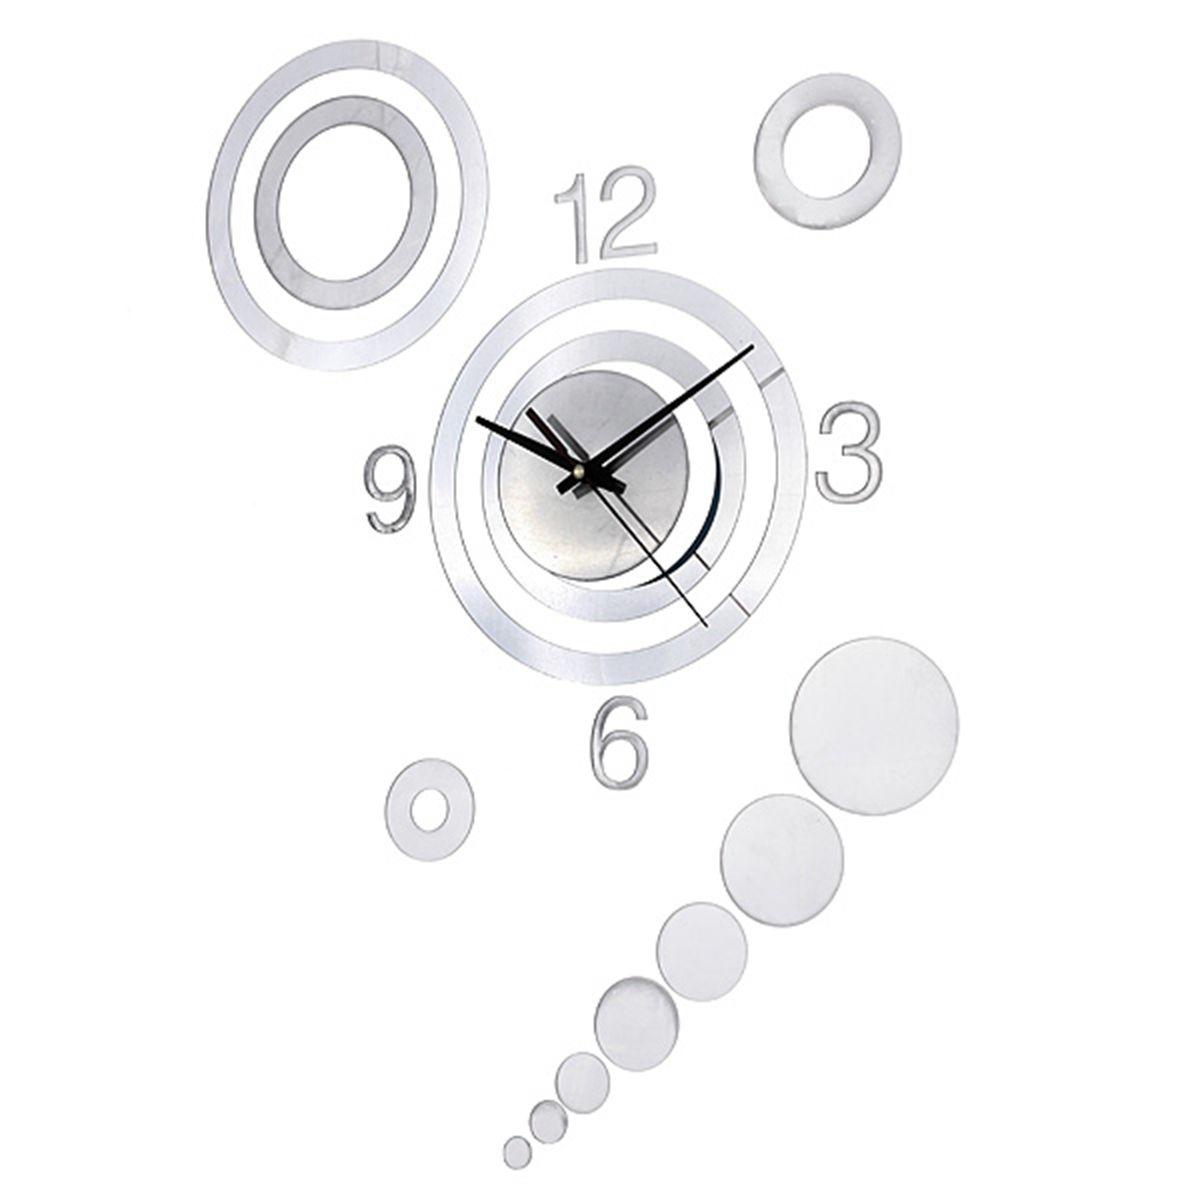 10 style diy 3d miroir horloge murale moderne decoration salon